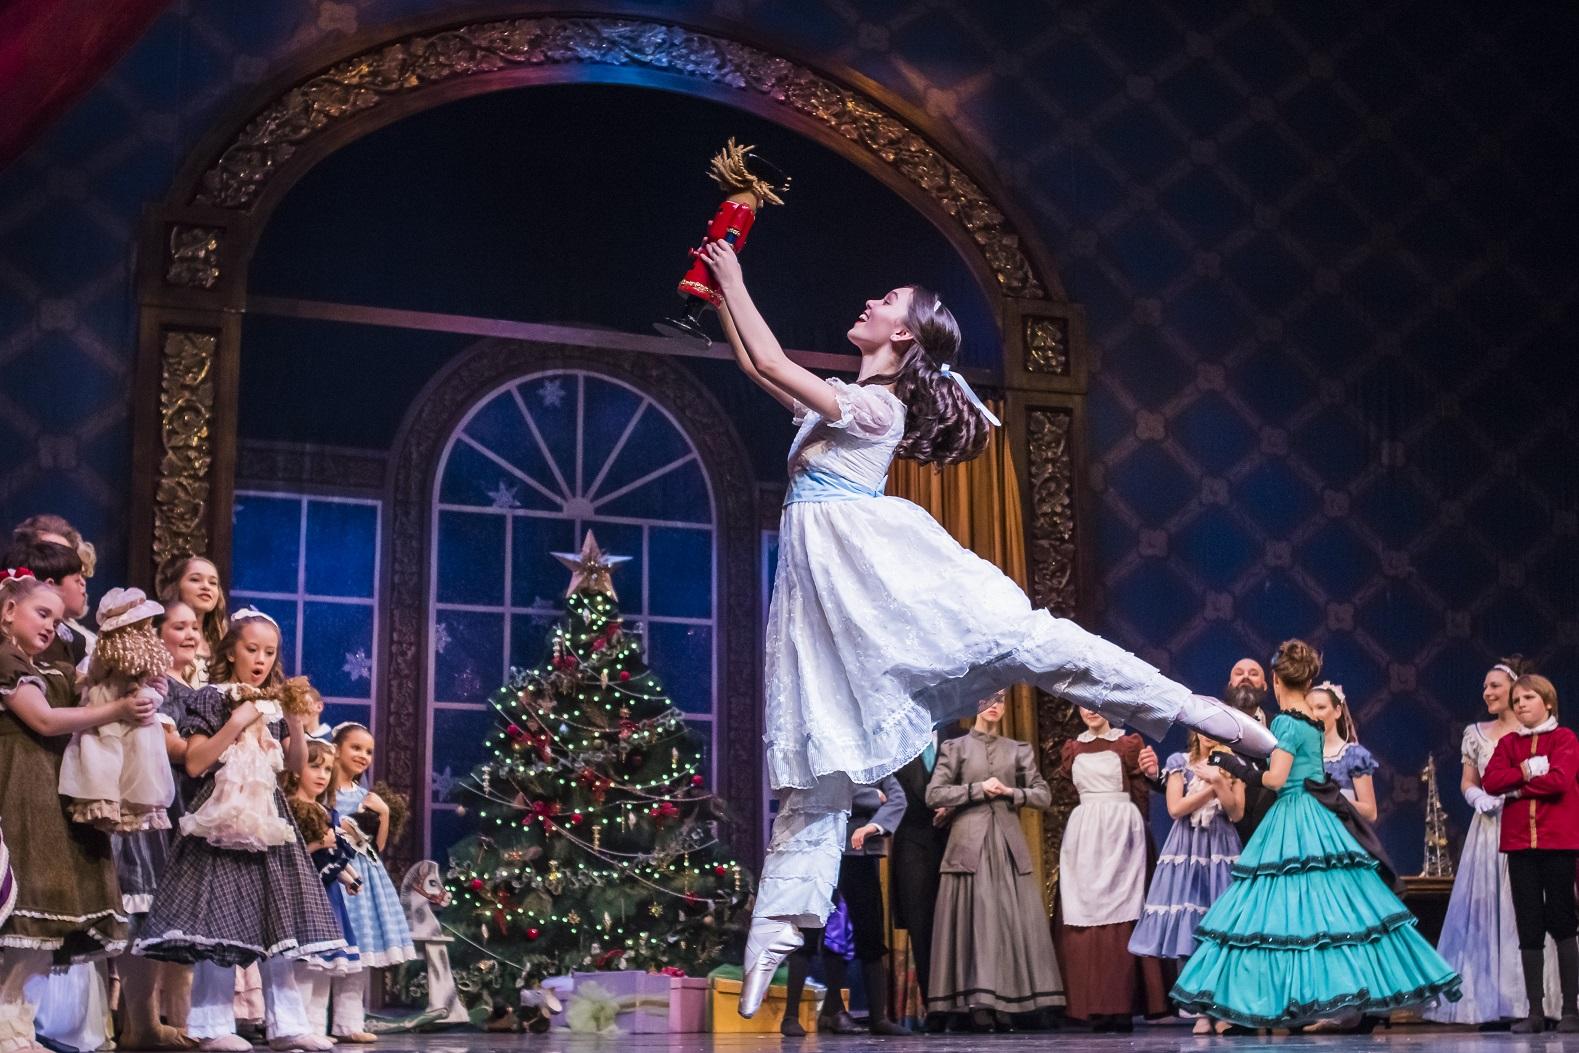 Family Favorite Nutcracker Ballet Returns To The Beautiful Minnaert Stage Thurstontalk